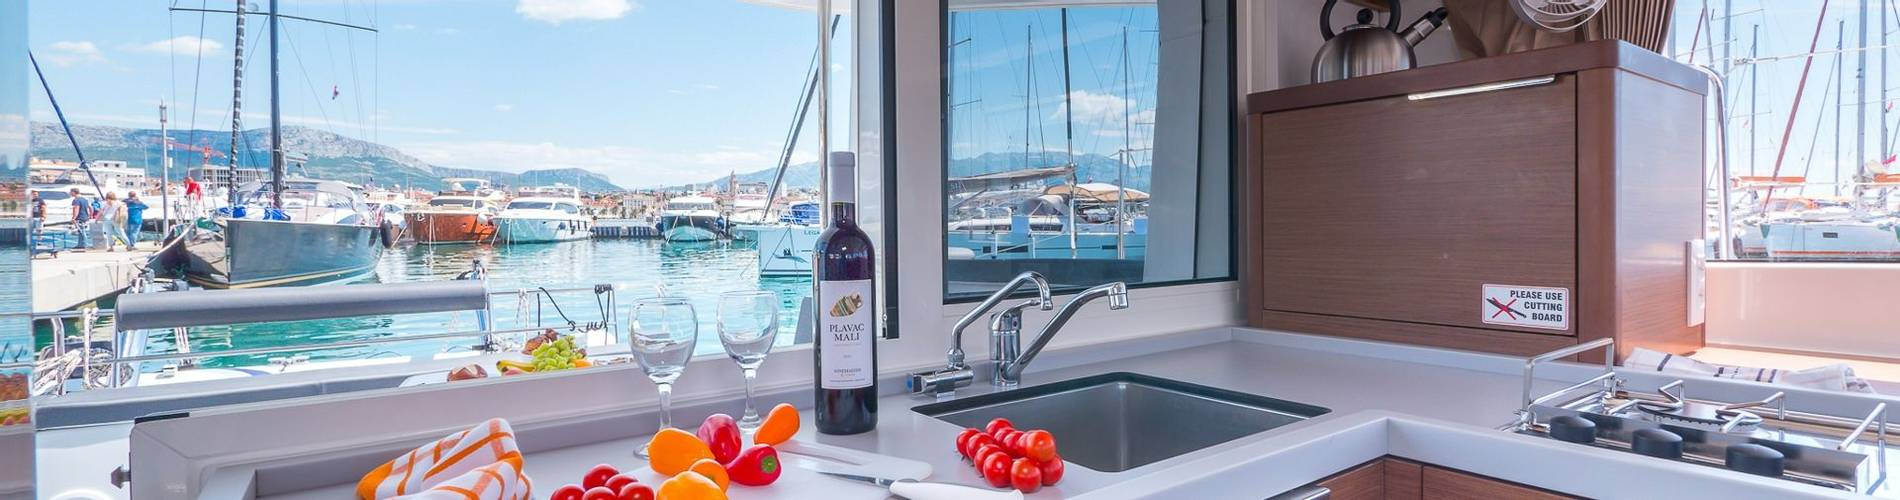 catamaran cruise 6.jpg